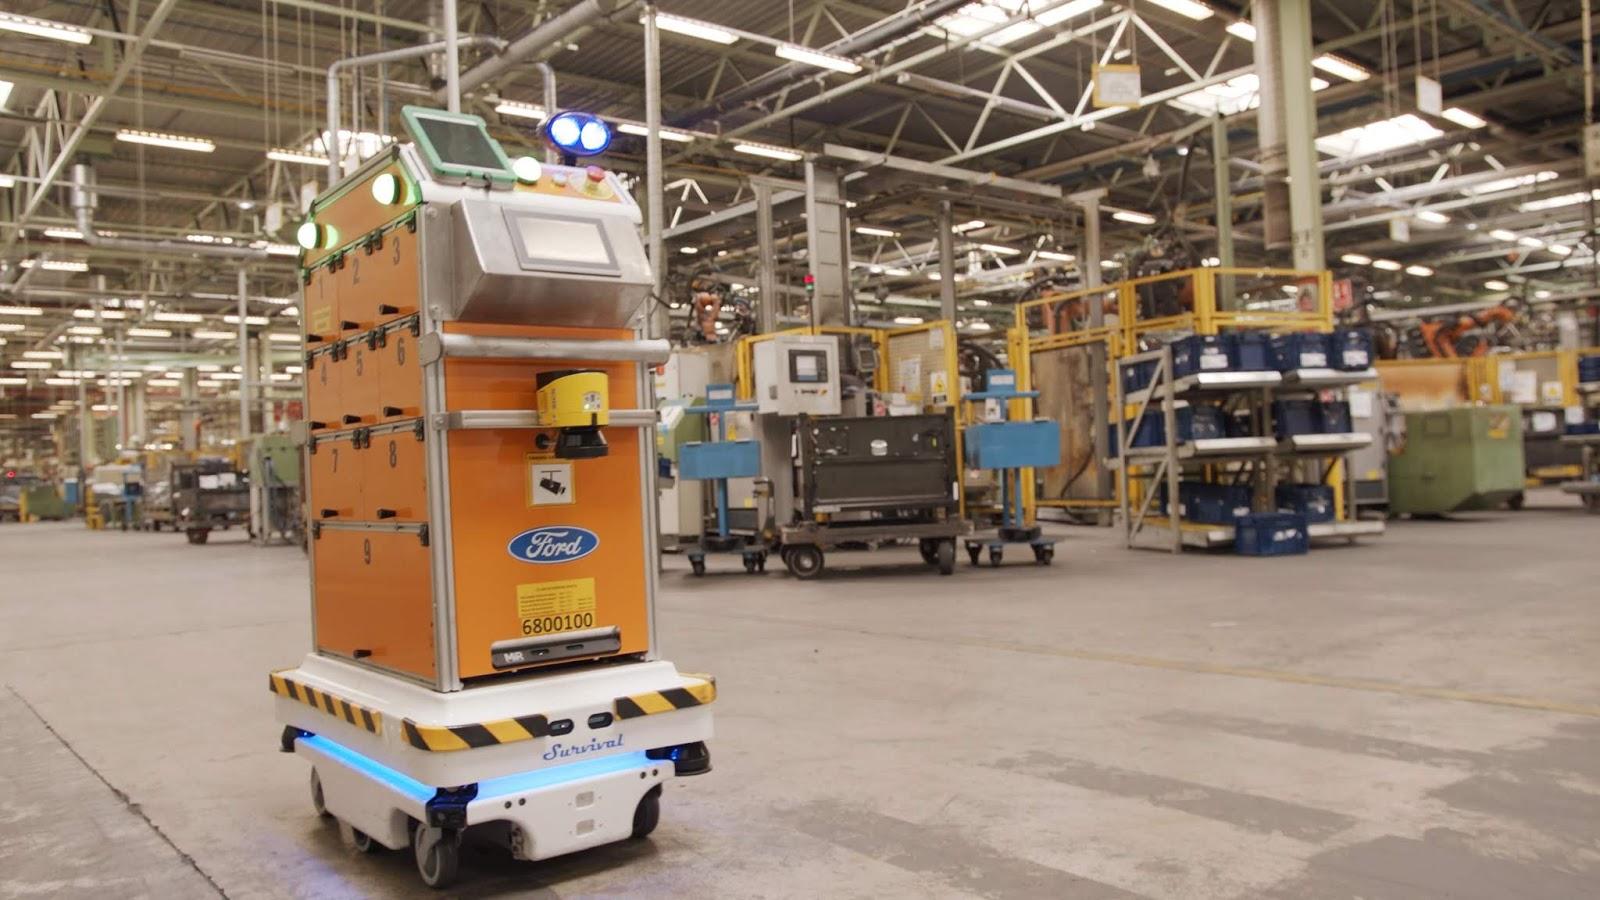 Ford SelfDrivingRobot 5 Η Ford έφτιαξε ένα ρομπότ για τις χαμαλοδουλειές του εργοστασίου της! Ford, video, videos, Εργοστάσιο, Τεχνολογία